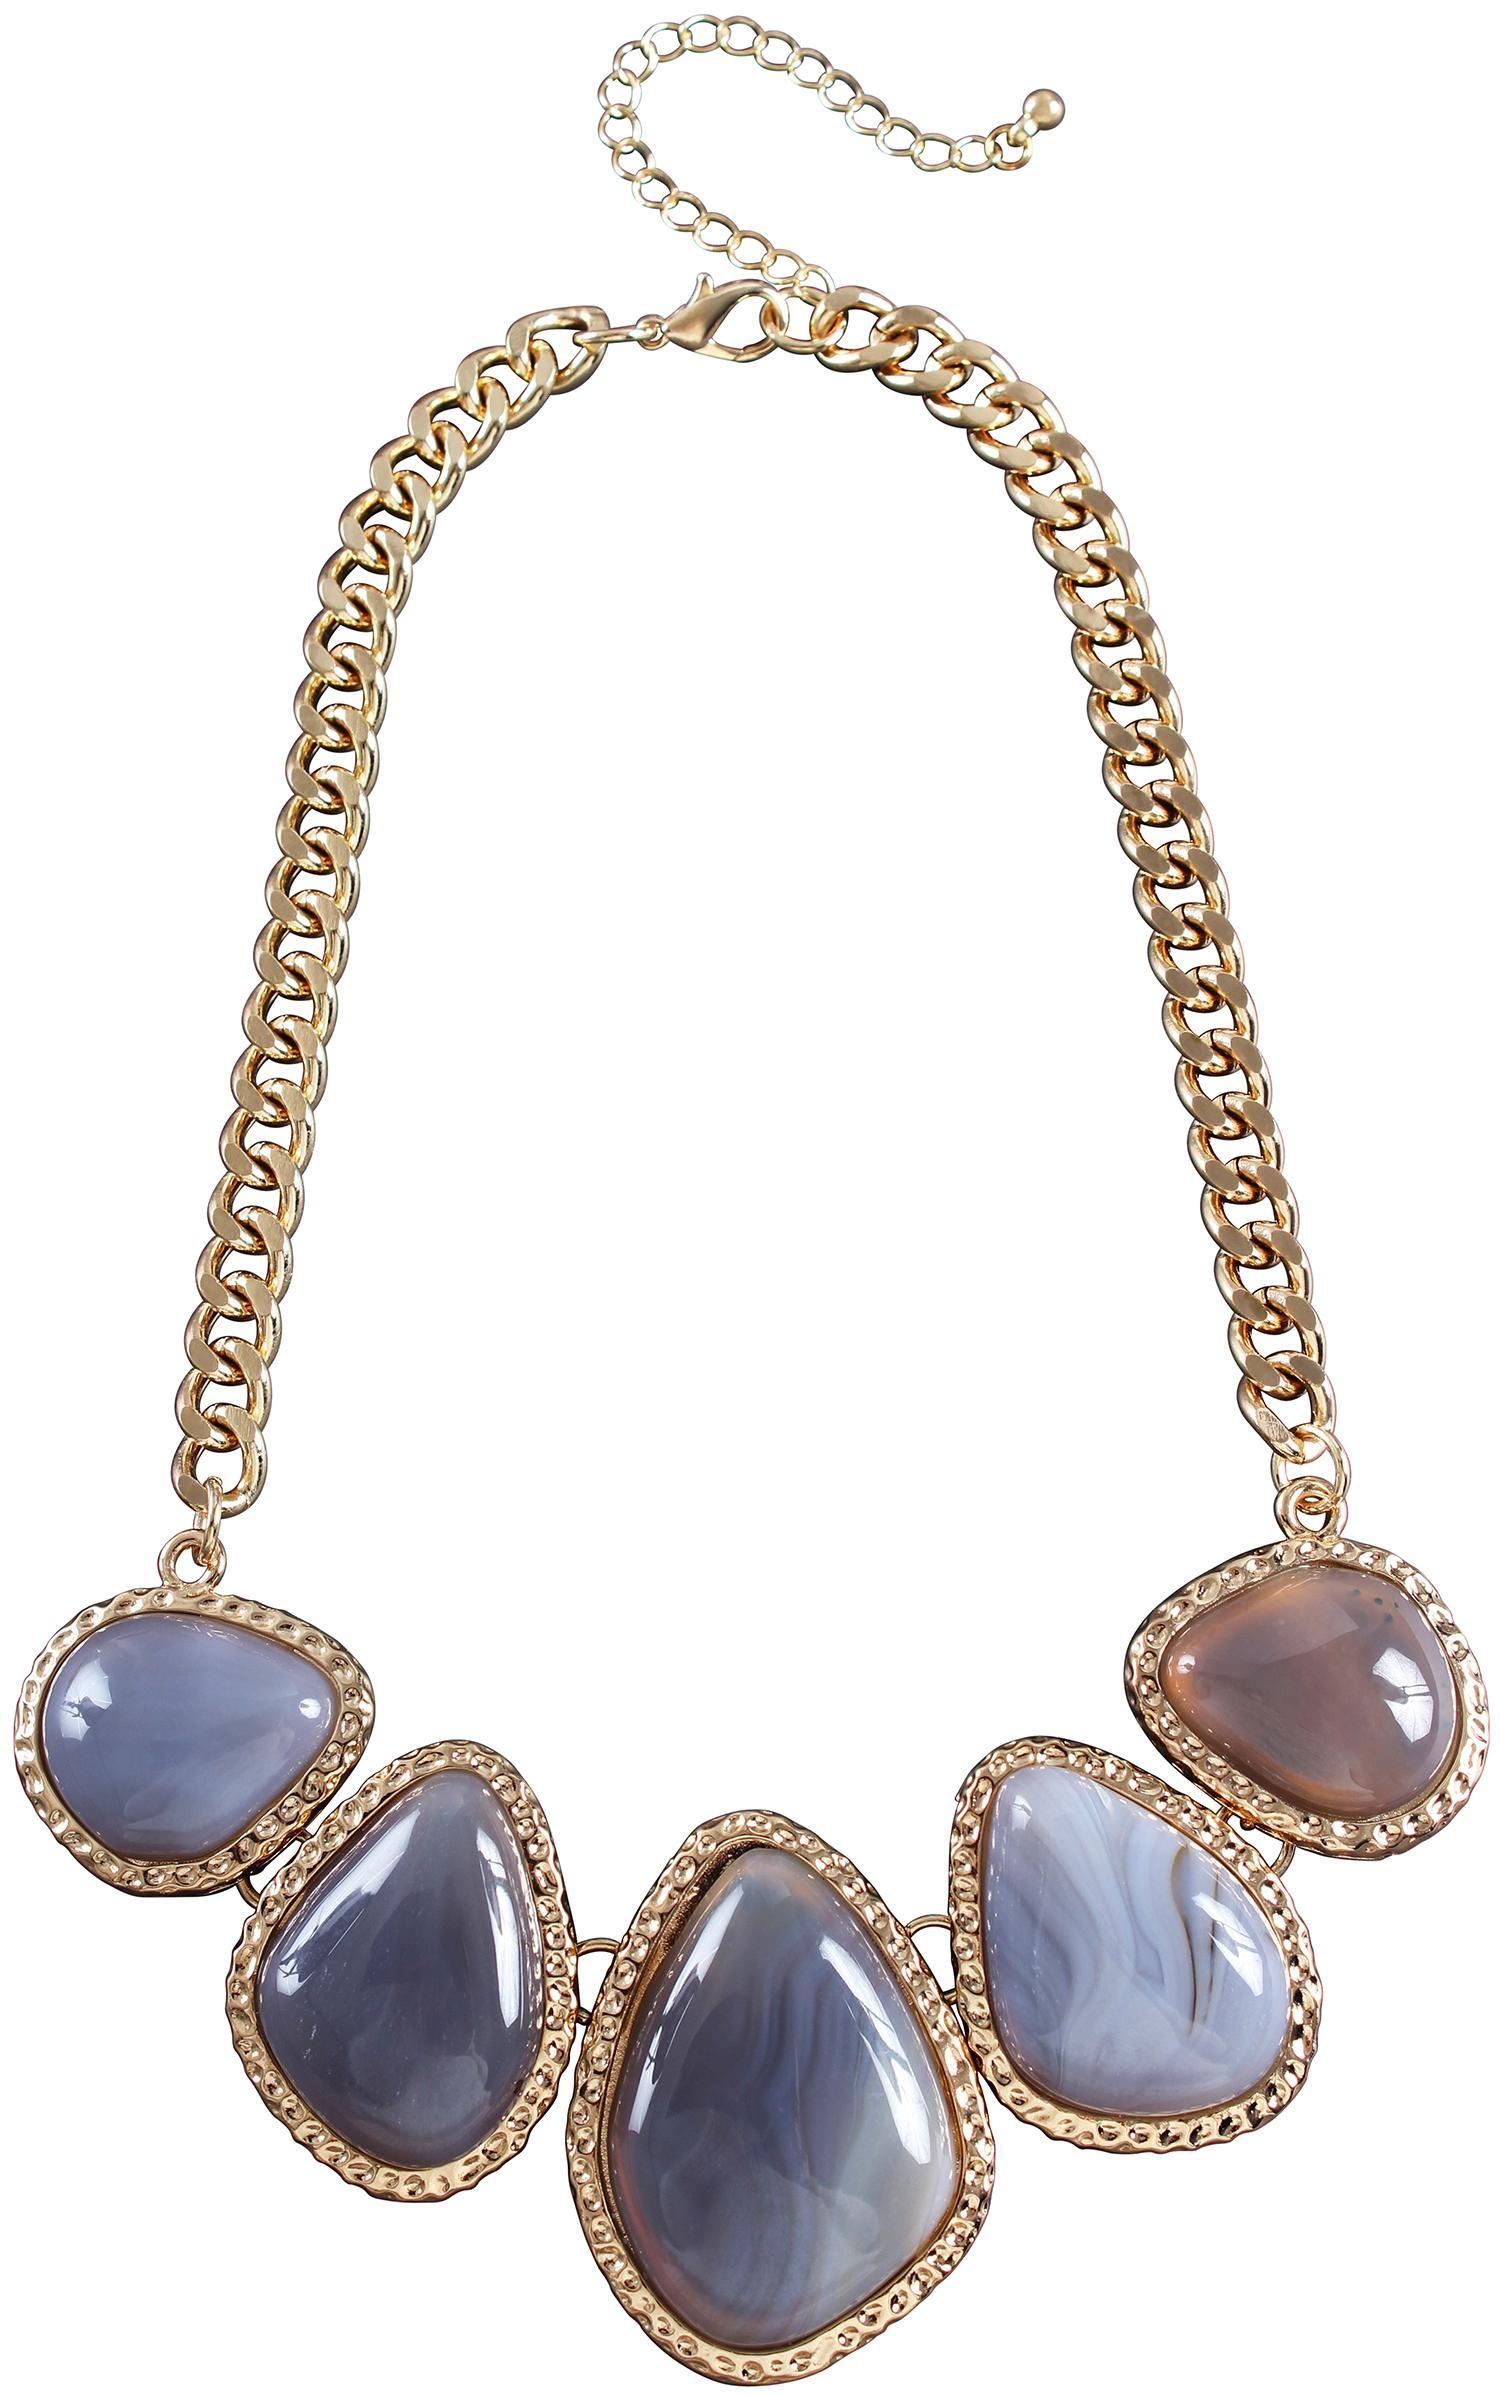 Collana - Agate Stones